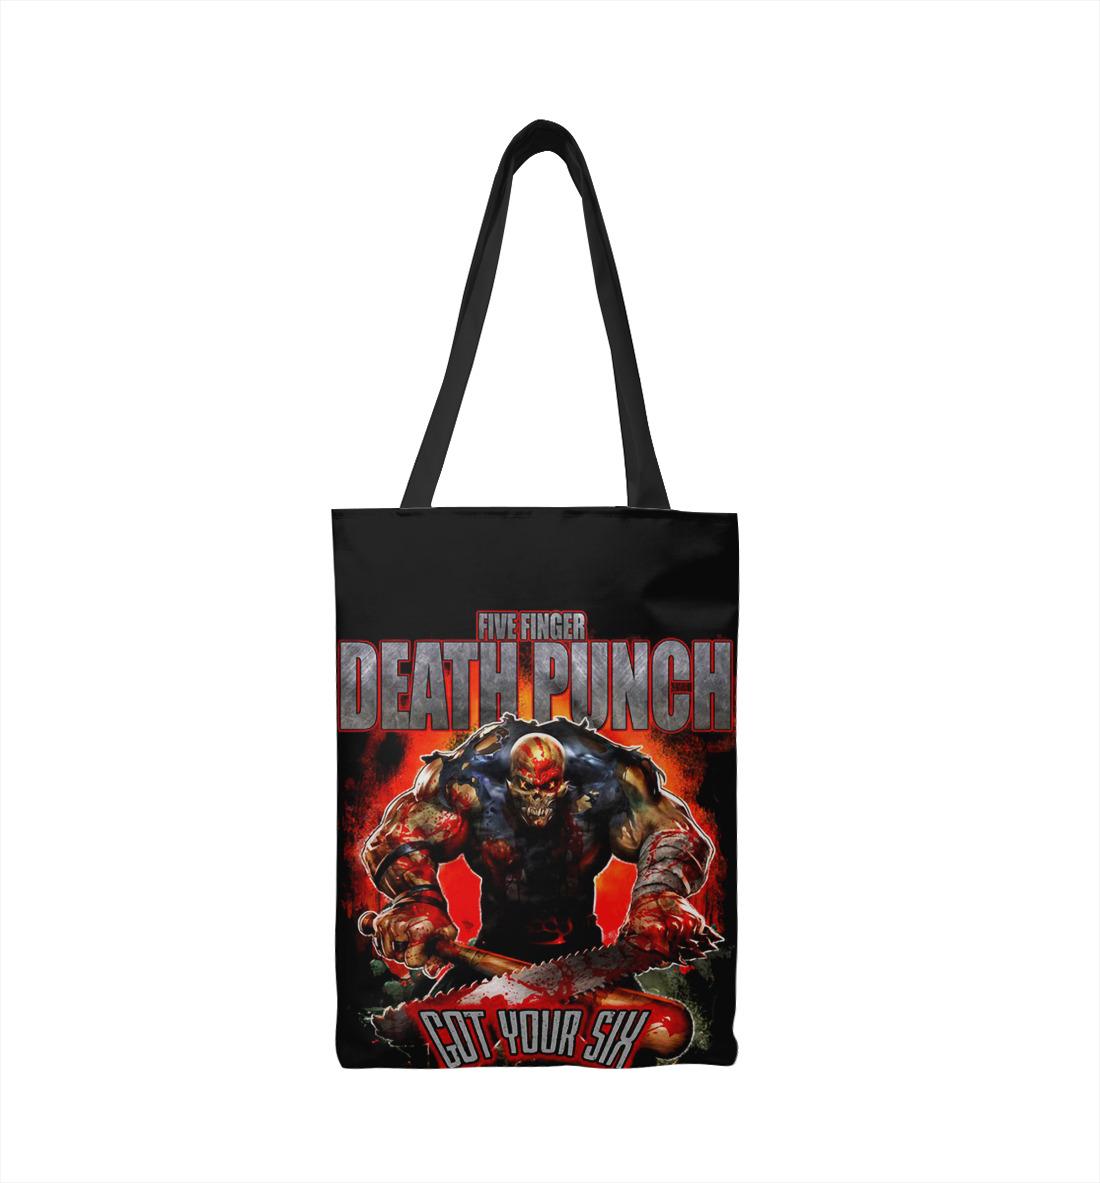 Фото - Five Finger Death Punch Got Your Six five finger death punch got your six